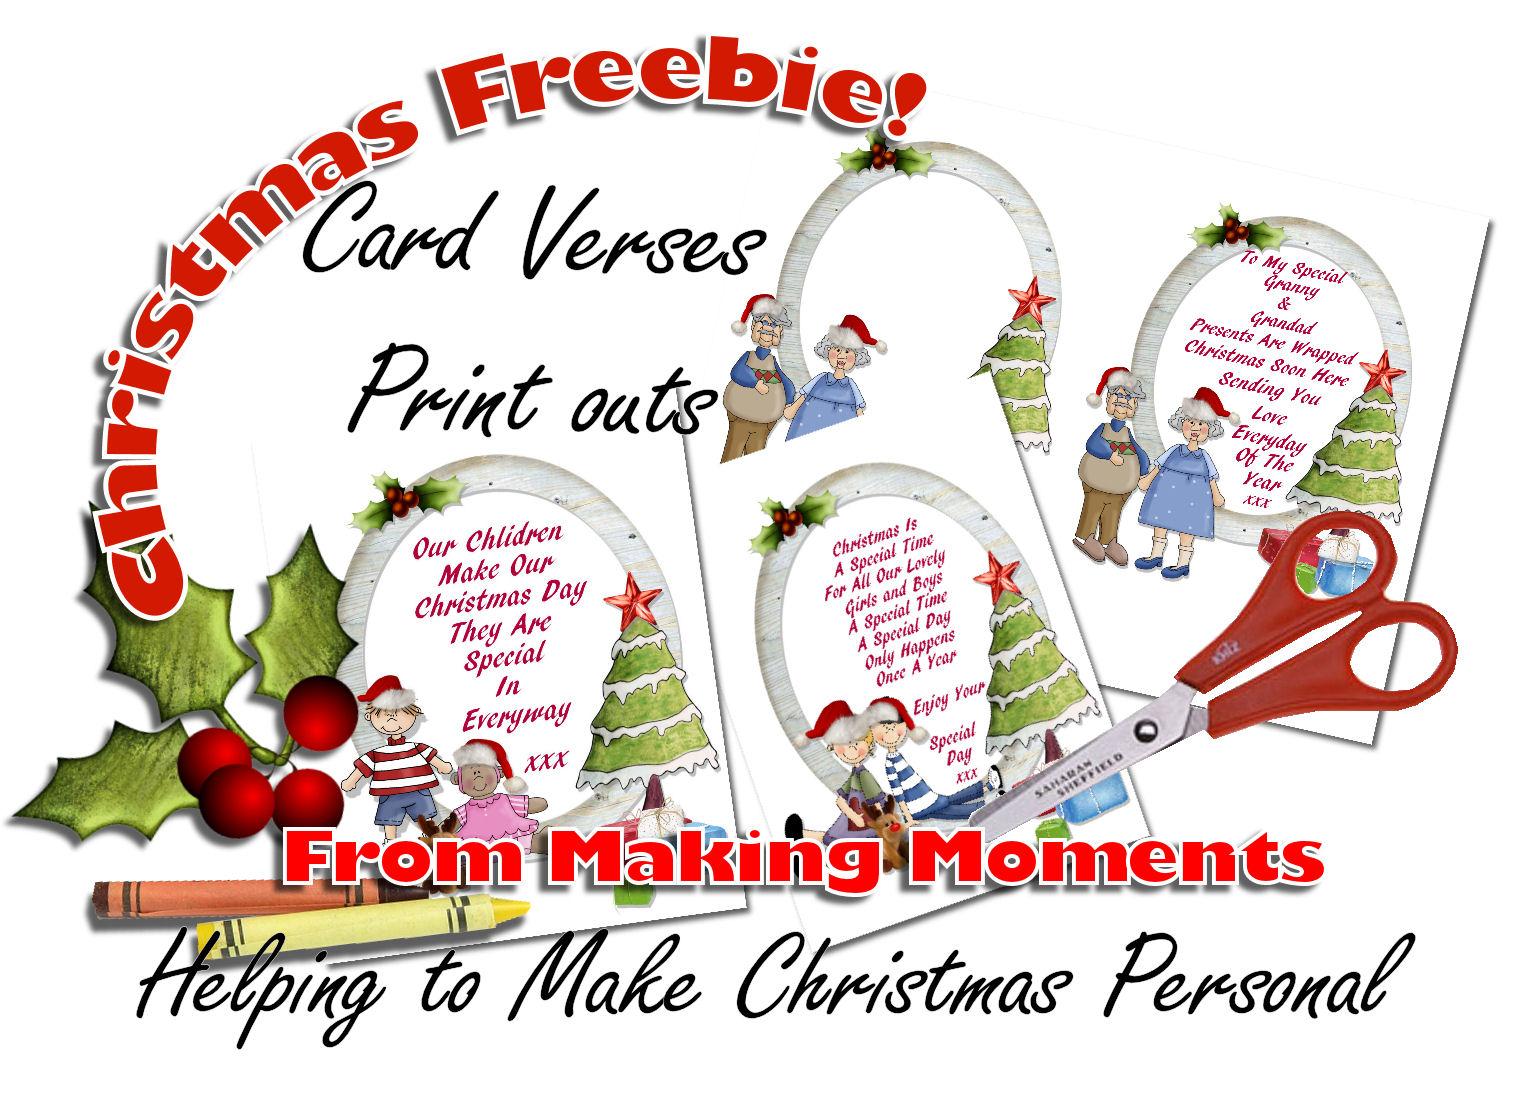 Making Moments Christmas Card Verses Freebies Print